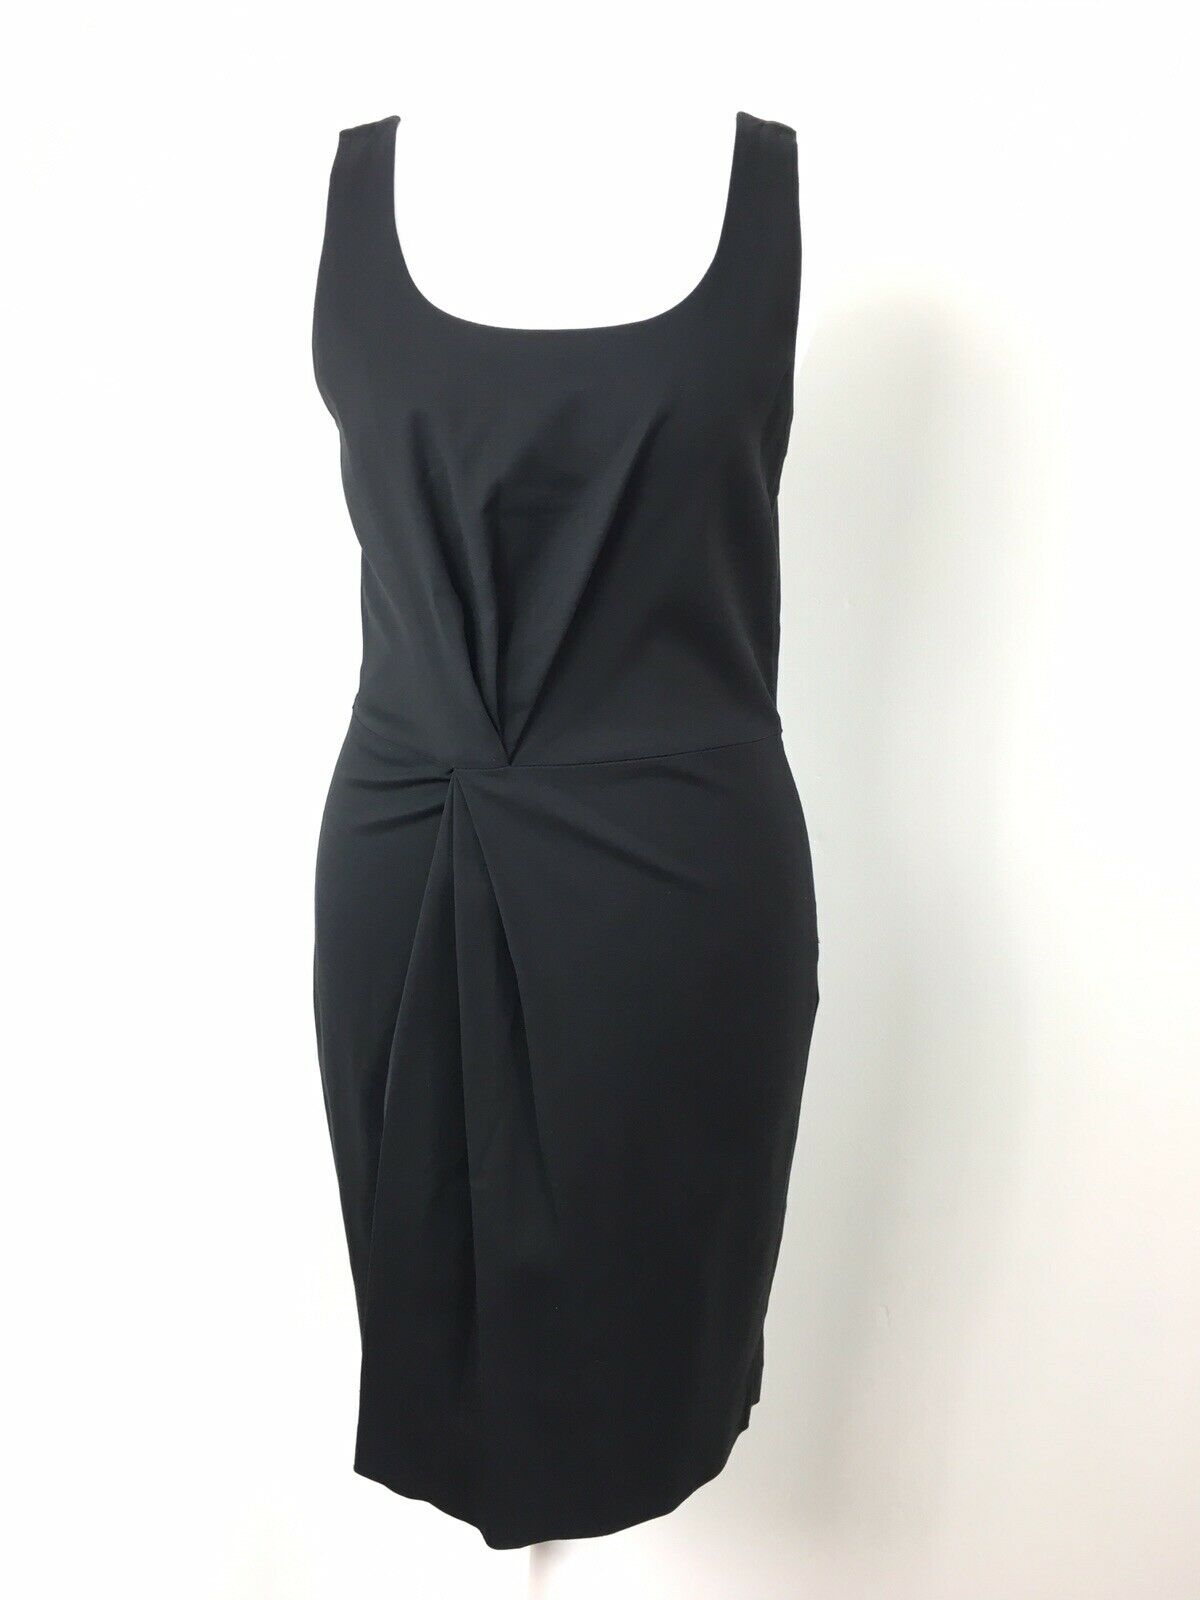 BNWT RRP  Armani Exchange schwarz Dress Twisted Ponte Mini LBD Party US 2